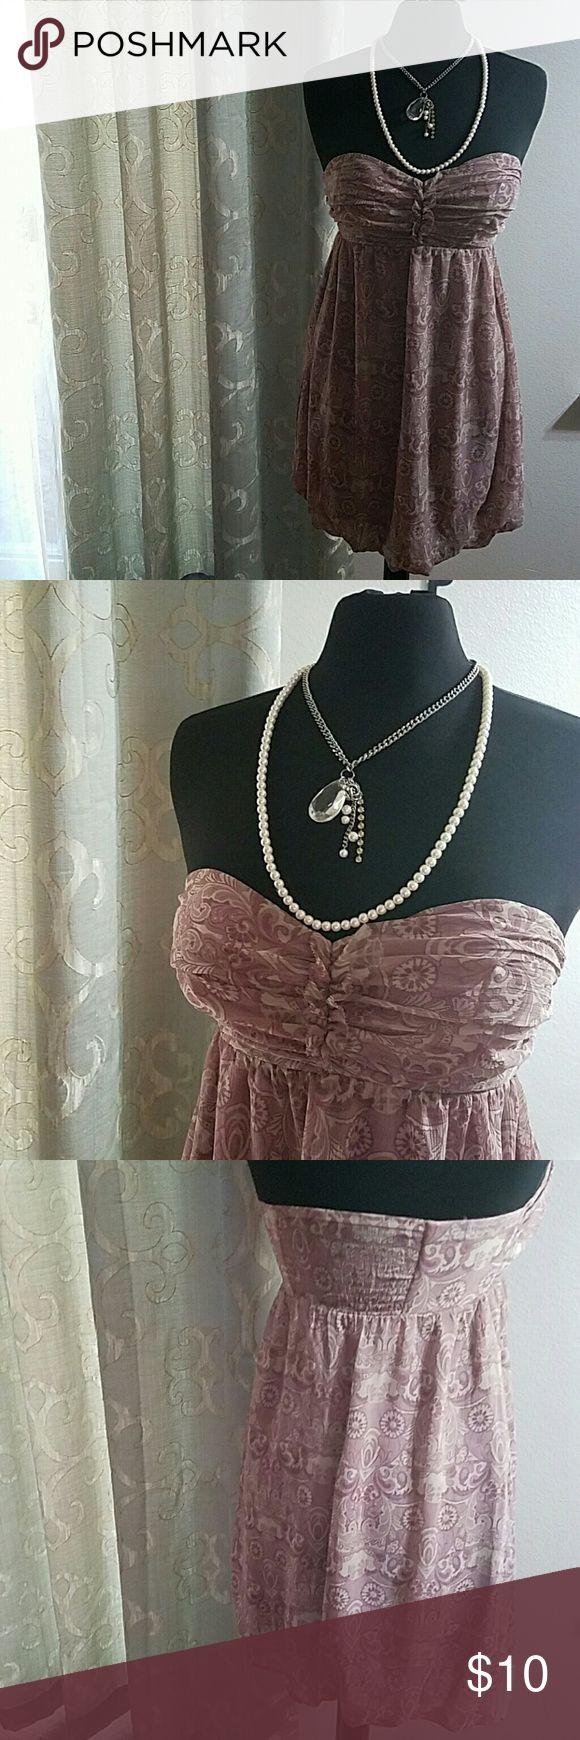 Guess Dress 7 GUC Size 7 strapless Guess Dress  Stretch back, side zipper, light padded & wire bra Guess Dresses